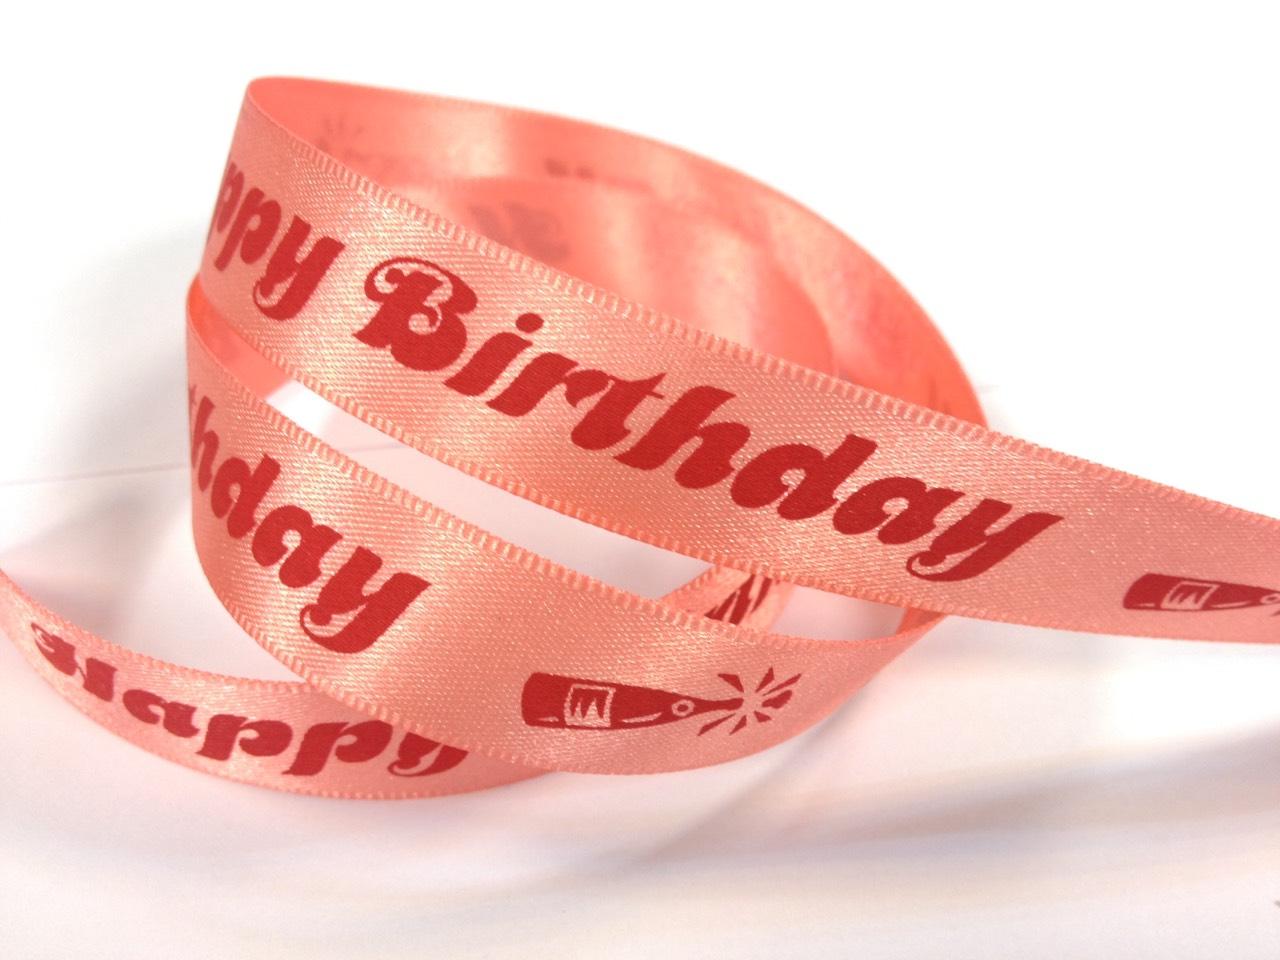 【Crystal Rose緞帶專賣店】雙面緞生日快樂-汽水瓶